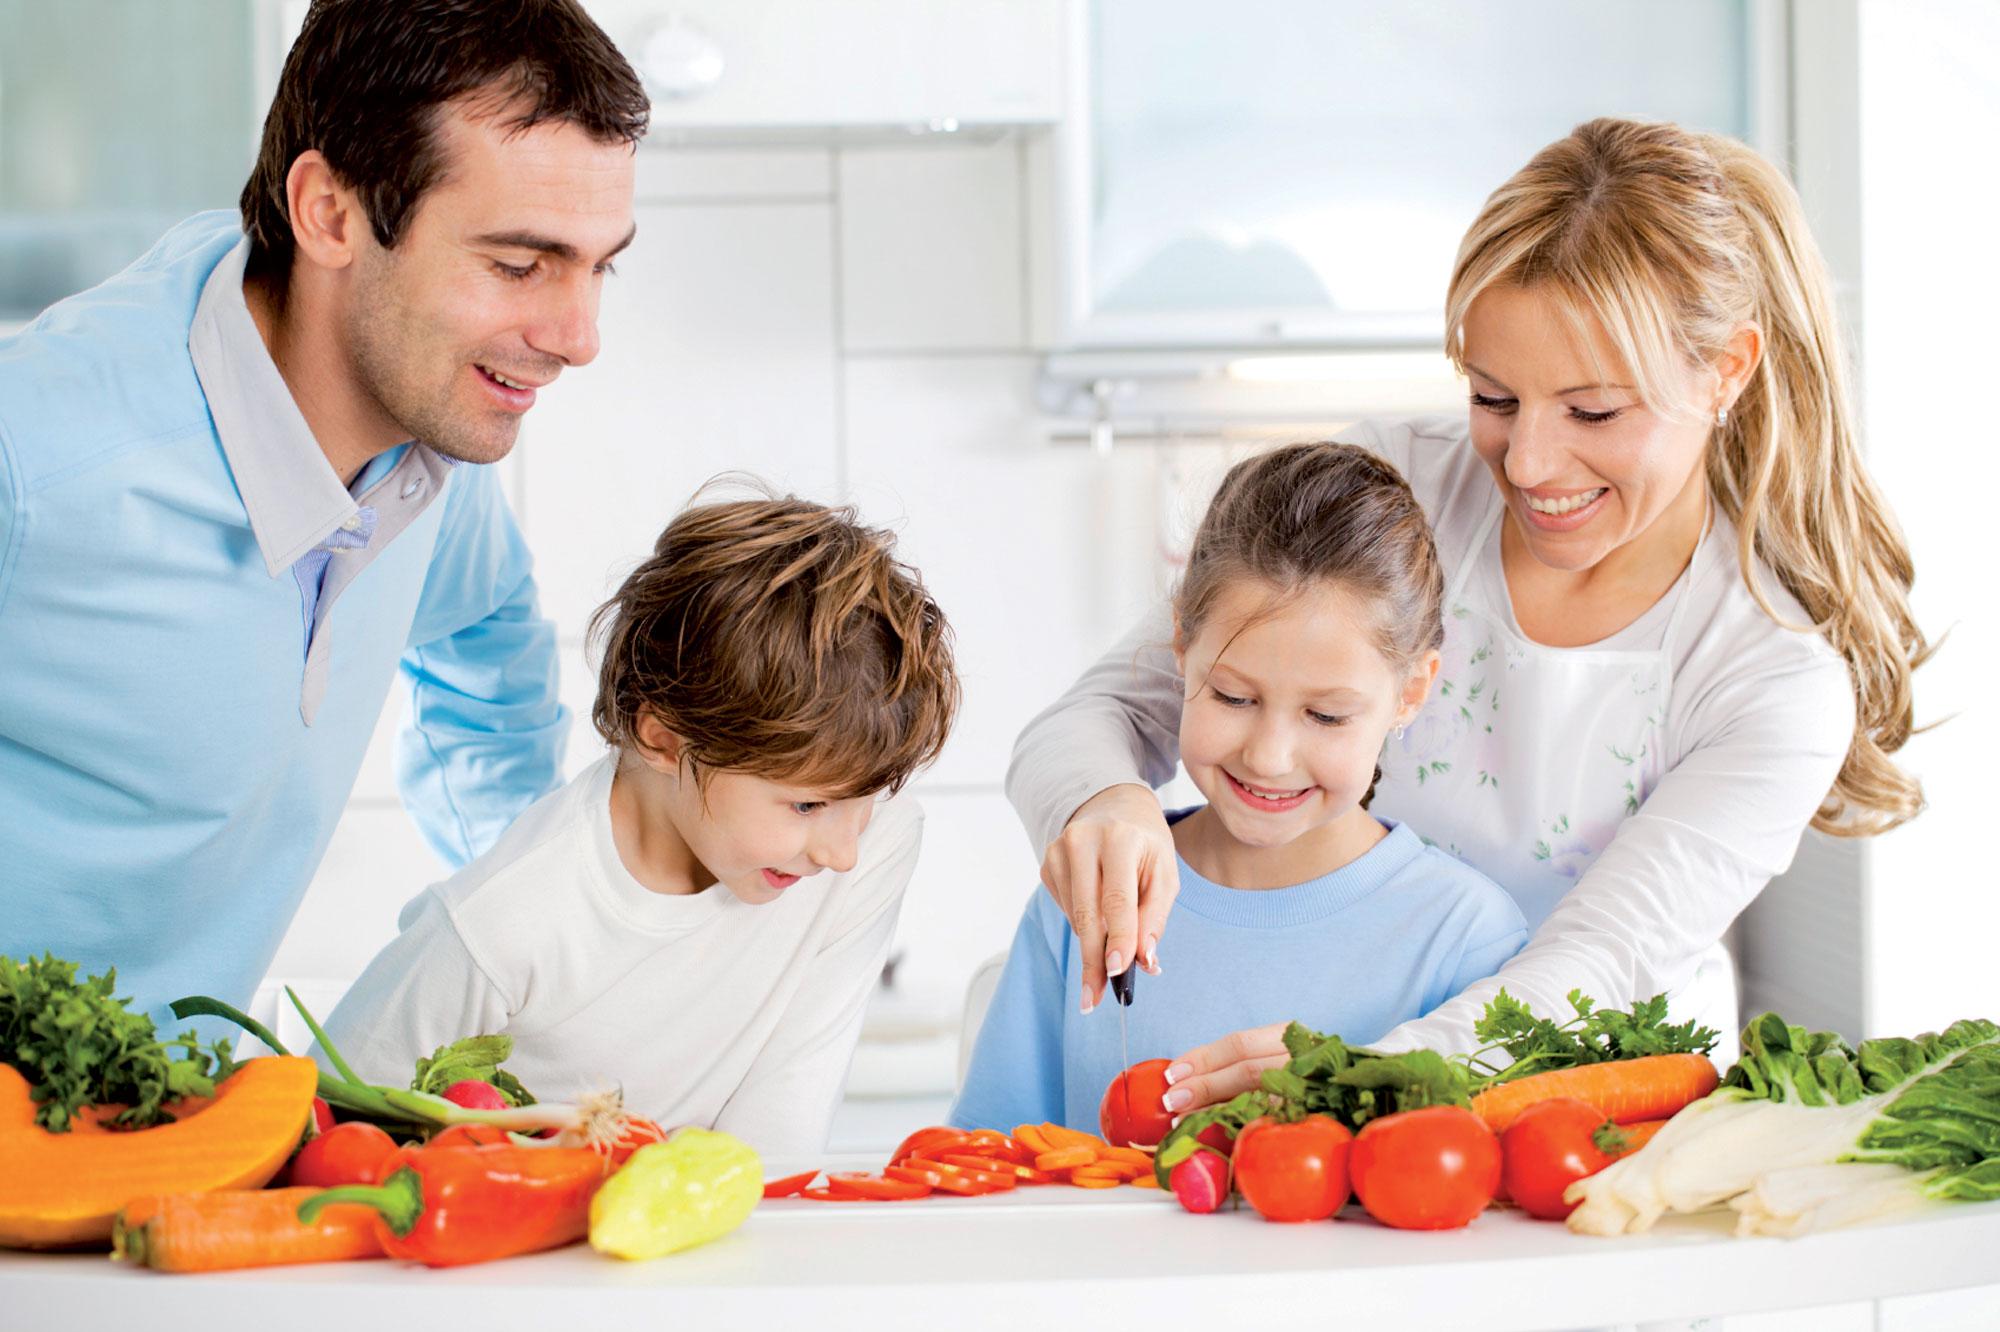 Dieta Settimanale Vegetariana : Dieta vegetariana pro e contro airc